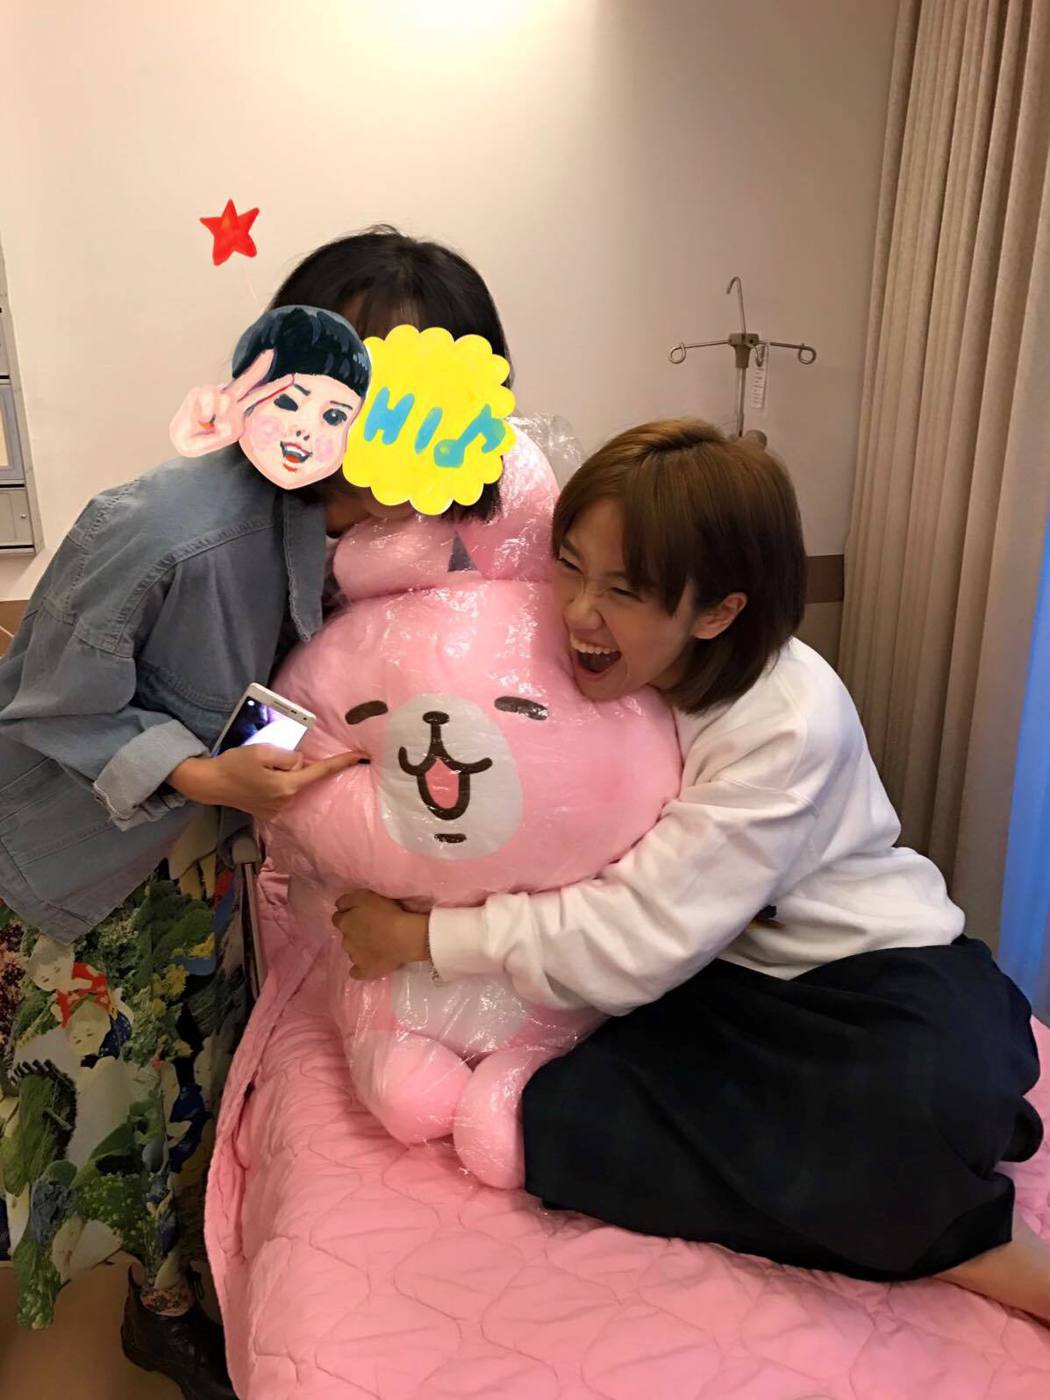 Lulu 26歲生日要住院開刀。 圖/擷自Lulu臉書